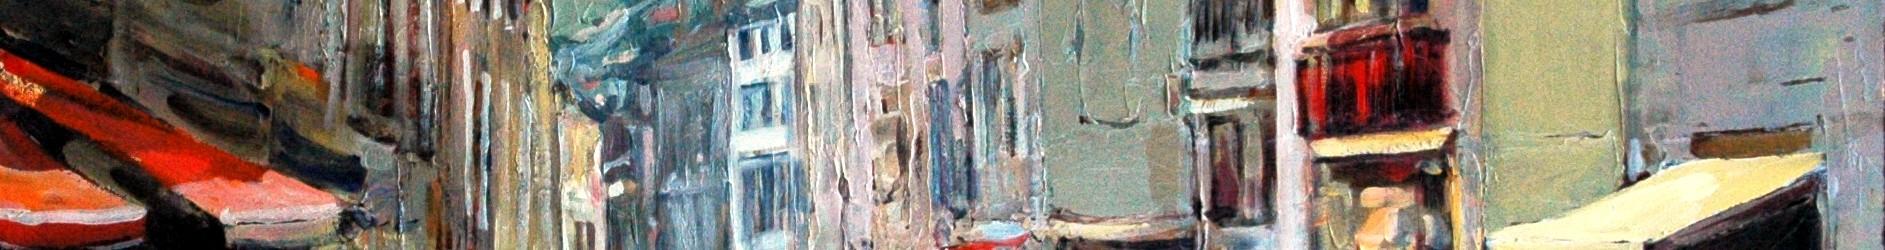 Saintes (60 x 60)